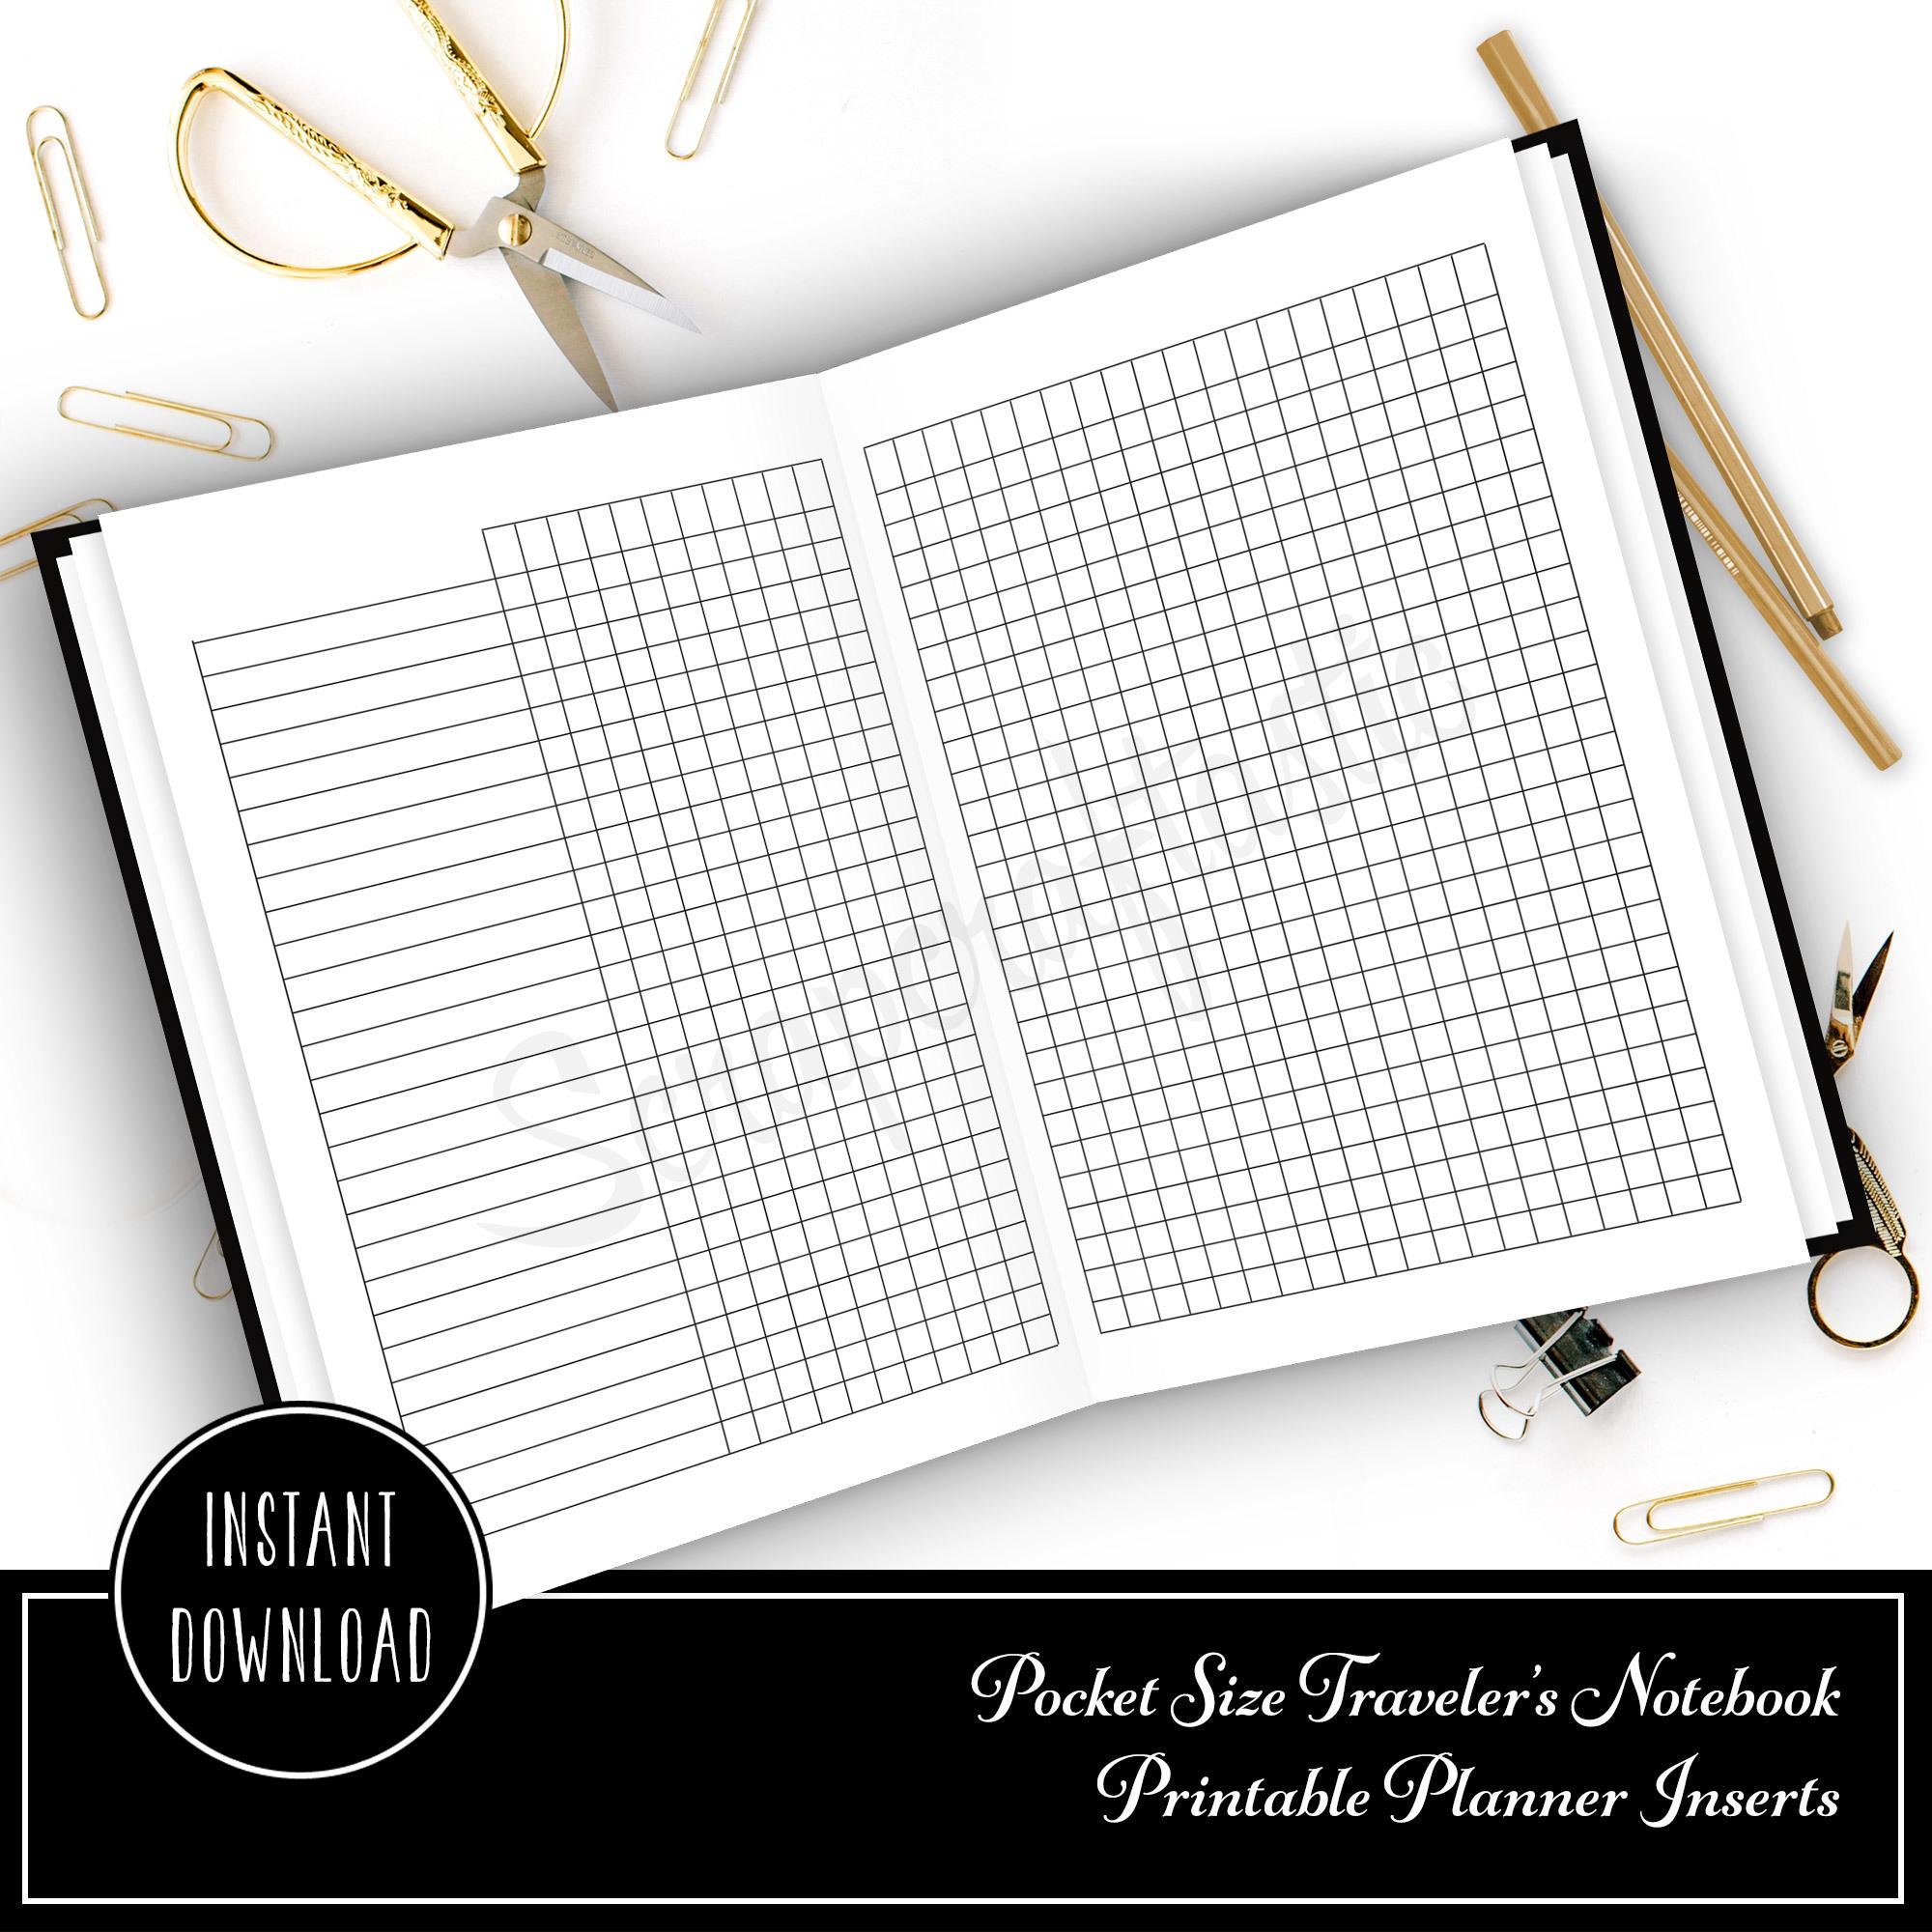 Habit Tracker Pocket Size Traveler's Notebook Printable Planner Inserts 00811